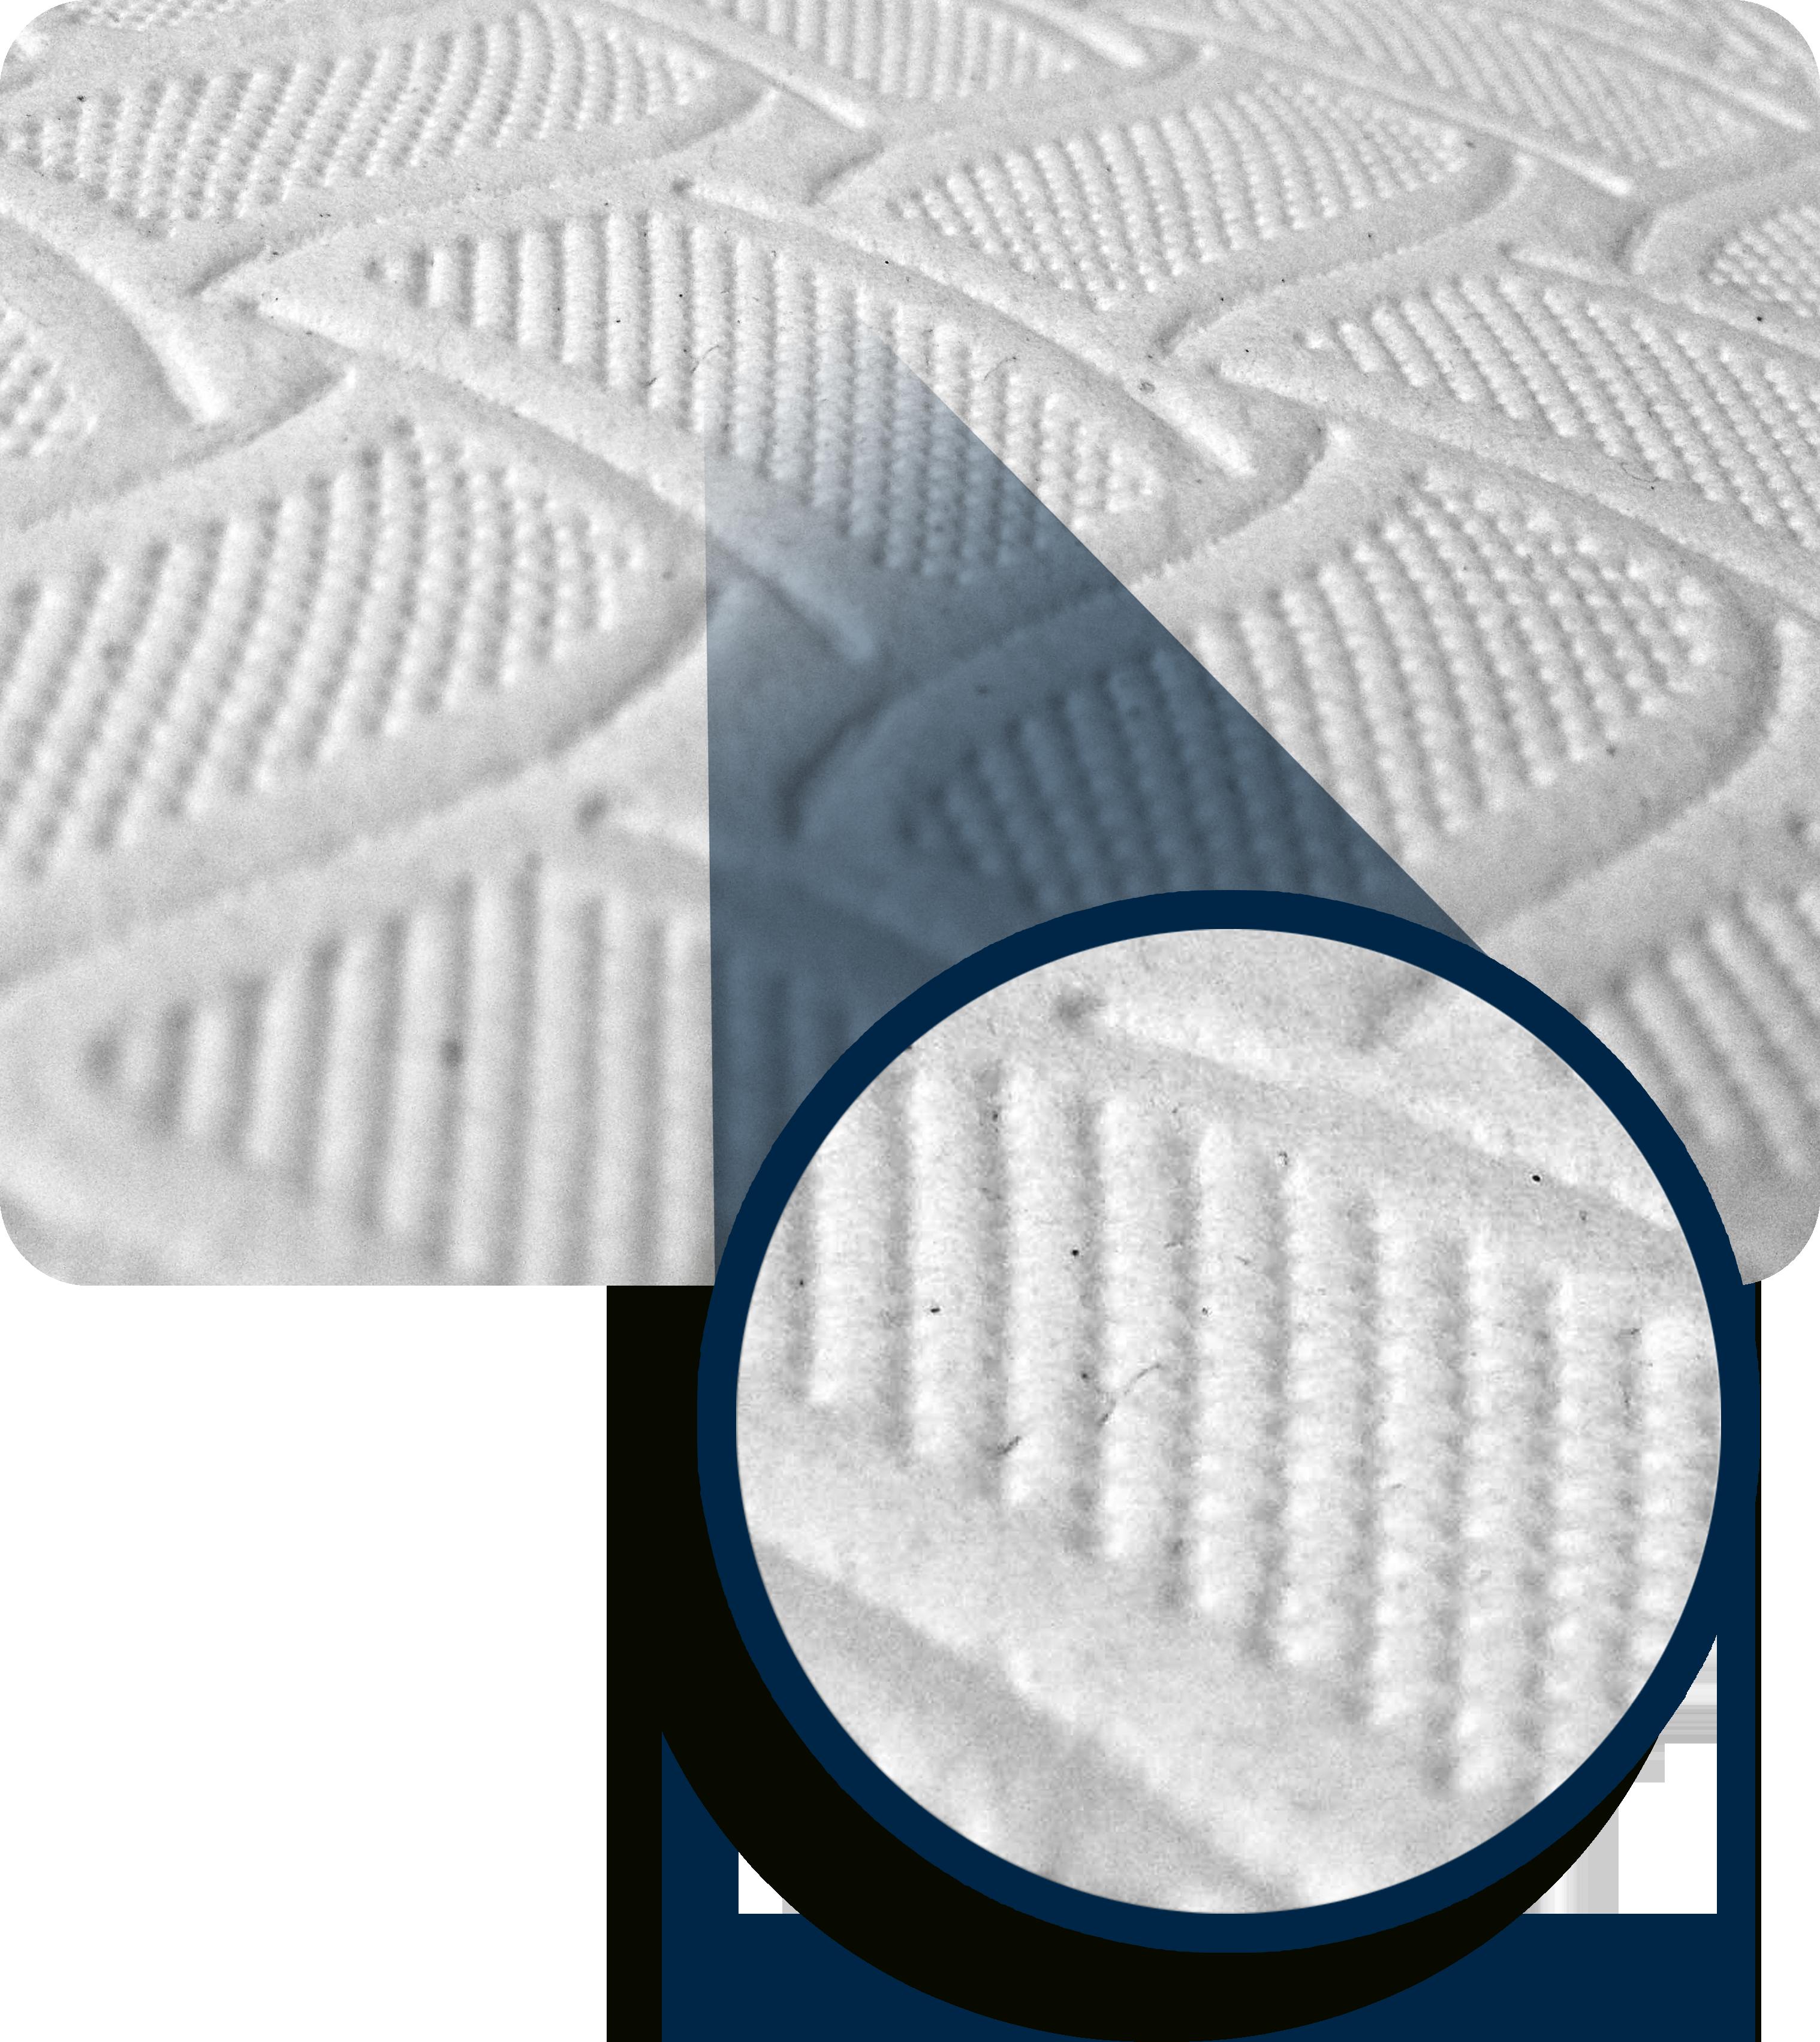 Tissue_higienico_segmentos_roll-tec